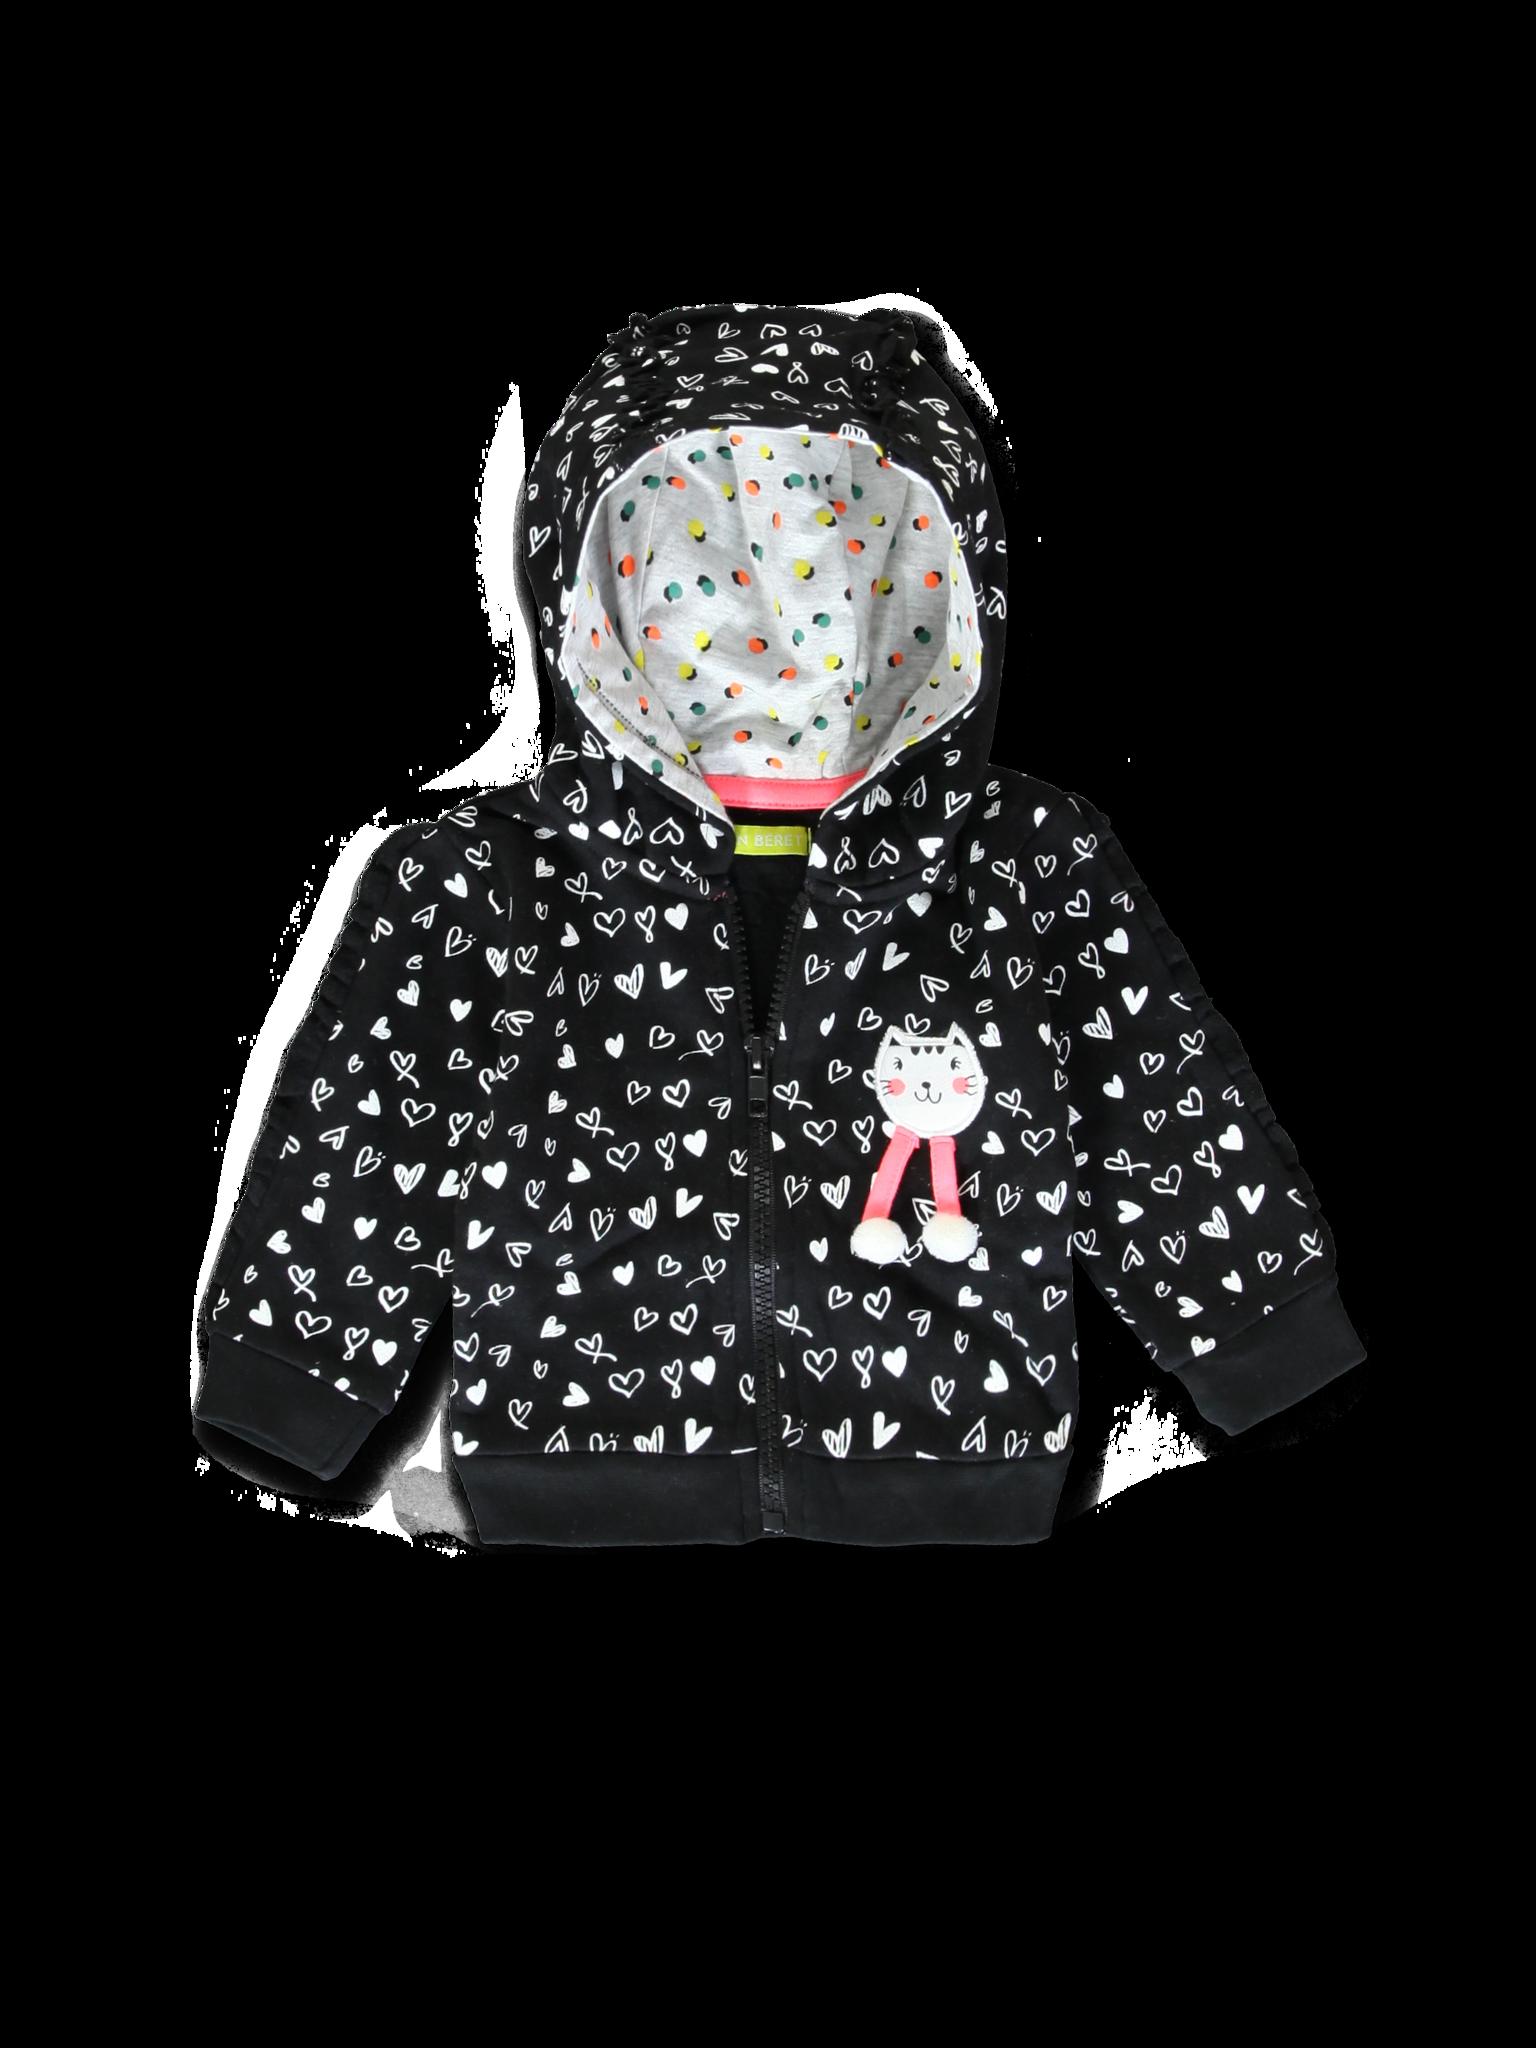 Lemon Beret | Winter 2019 Baby | Cardigan Sweater | 8 pcs/box